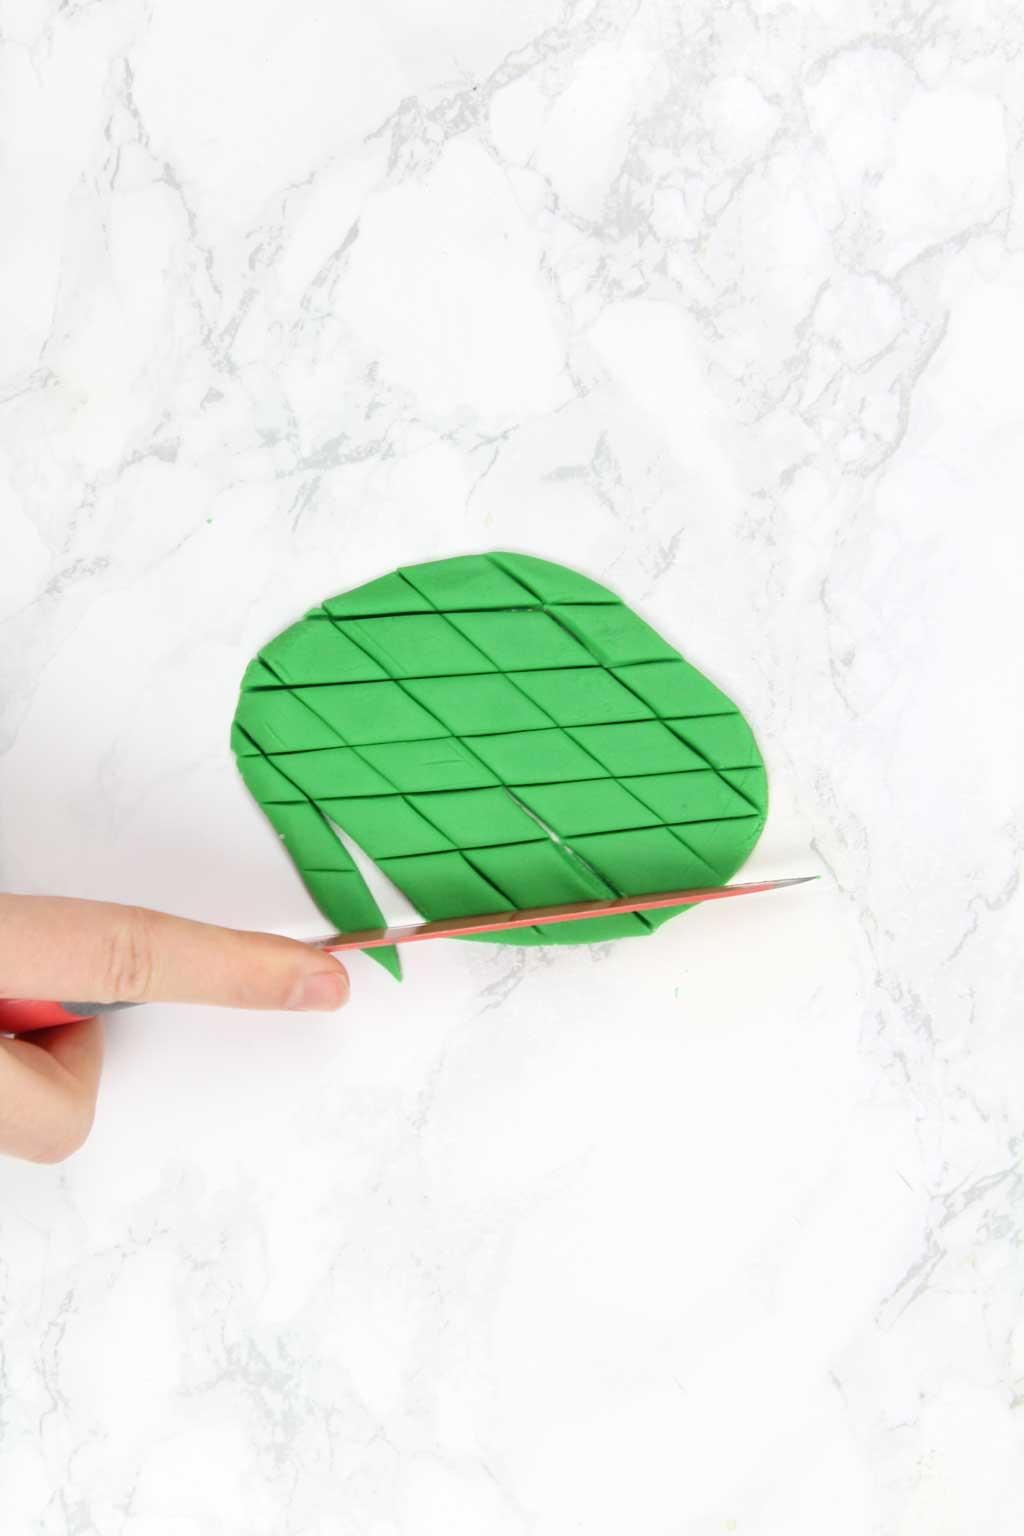 cutting diagonal lines into green fondant